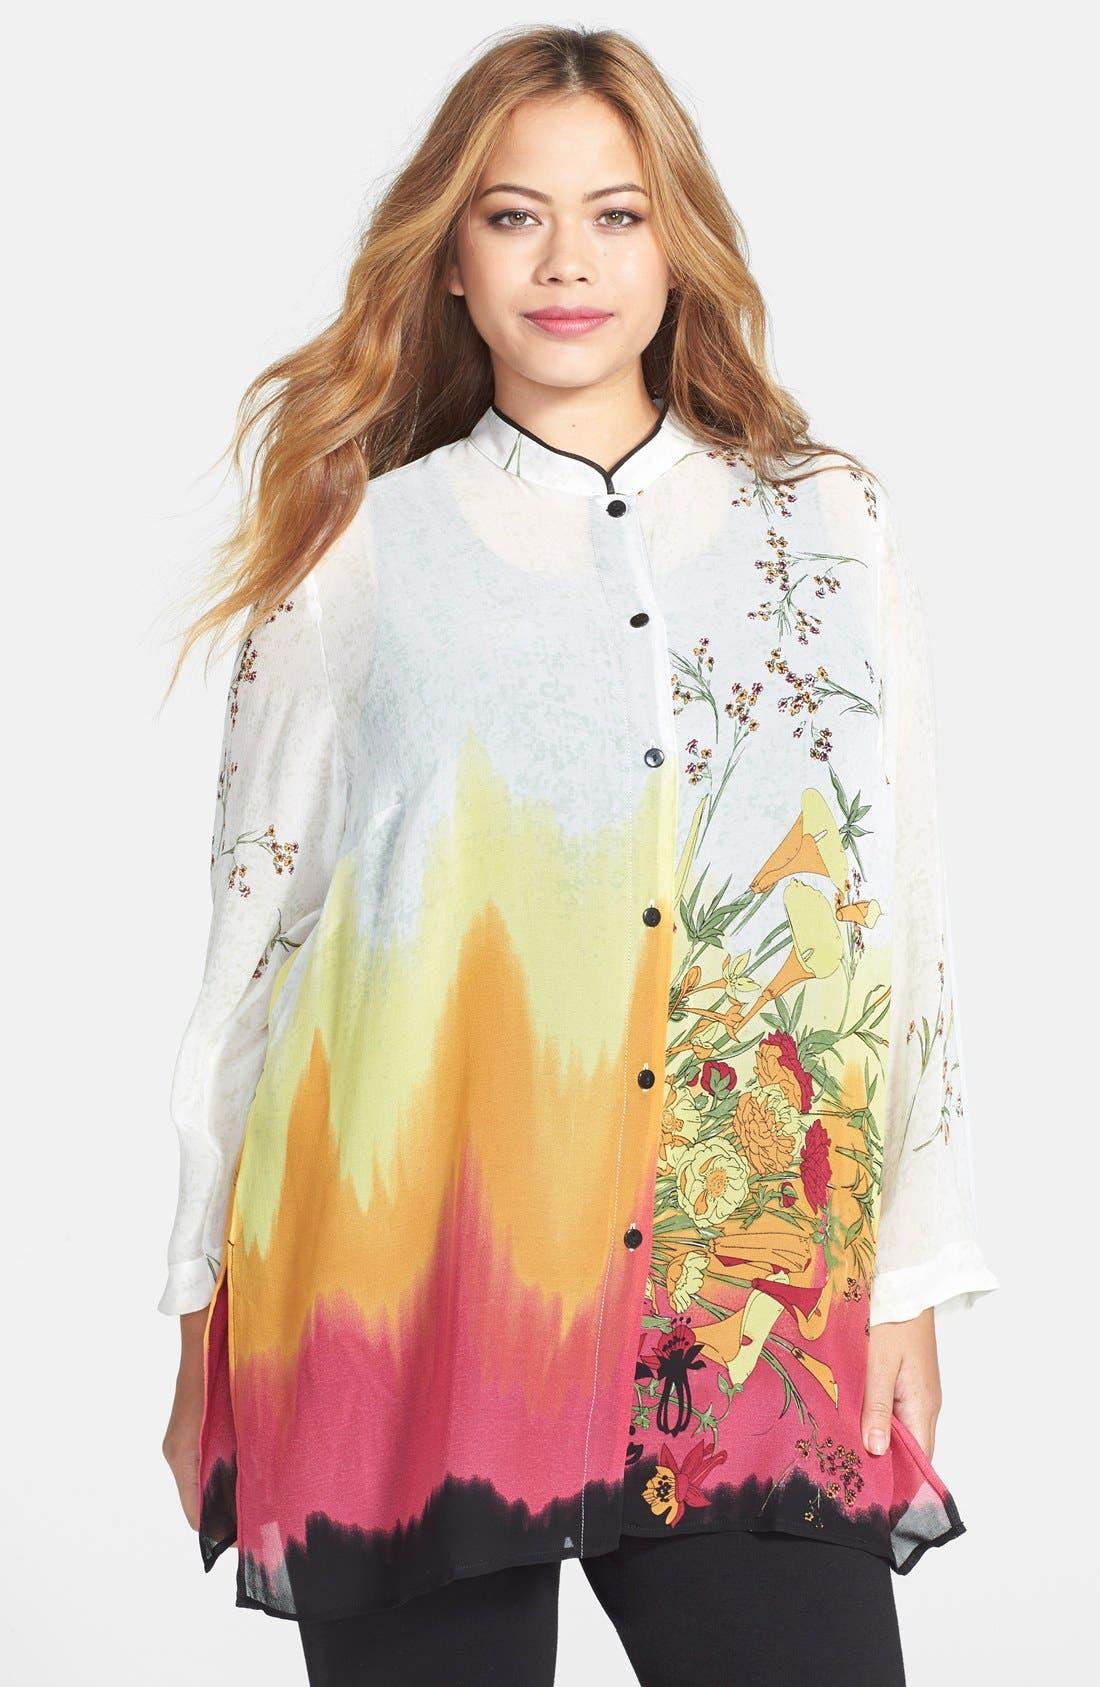 Alternate Image 1 Selected - Citron Blouse Mandarin Collar Print Silk Tunic Blouse (Plus Size)